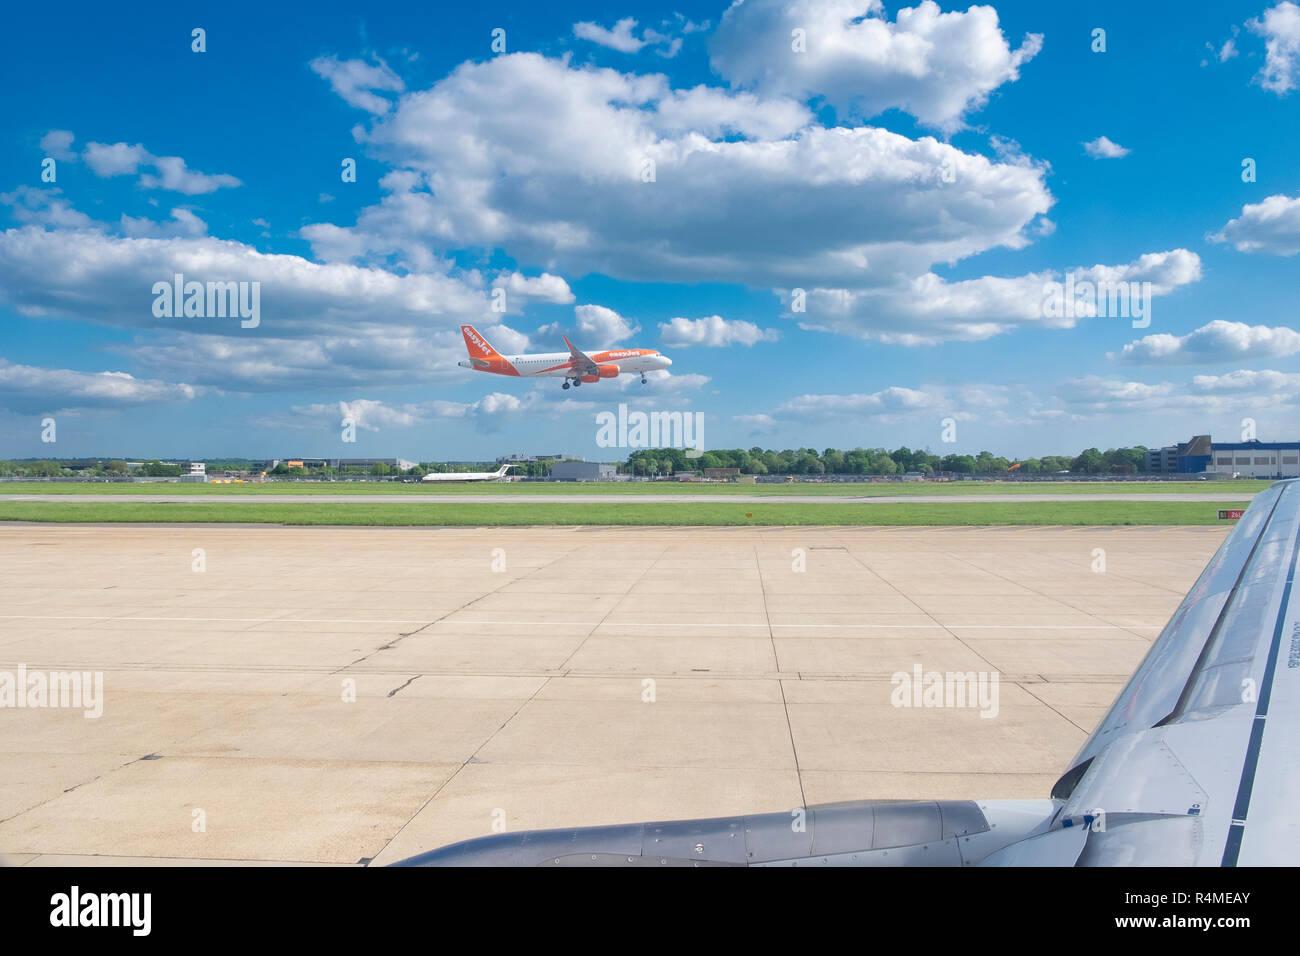 Easyjet plane landing at London Gatwick Airport, Sussex, UK - Stock Image